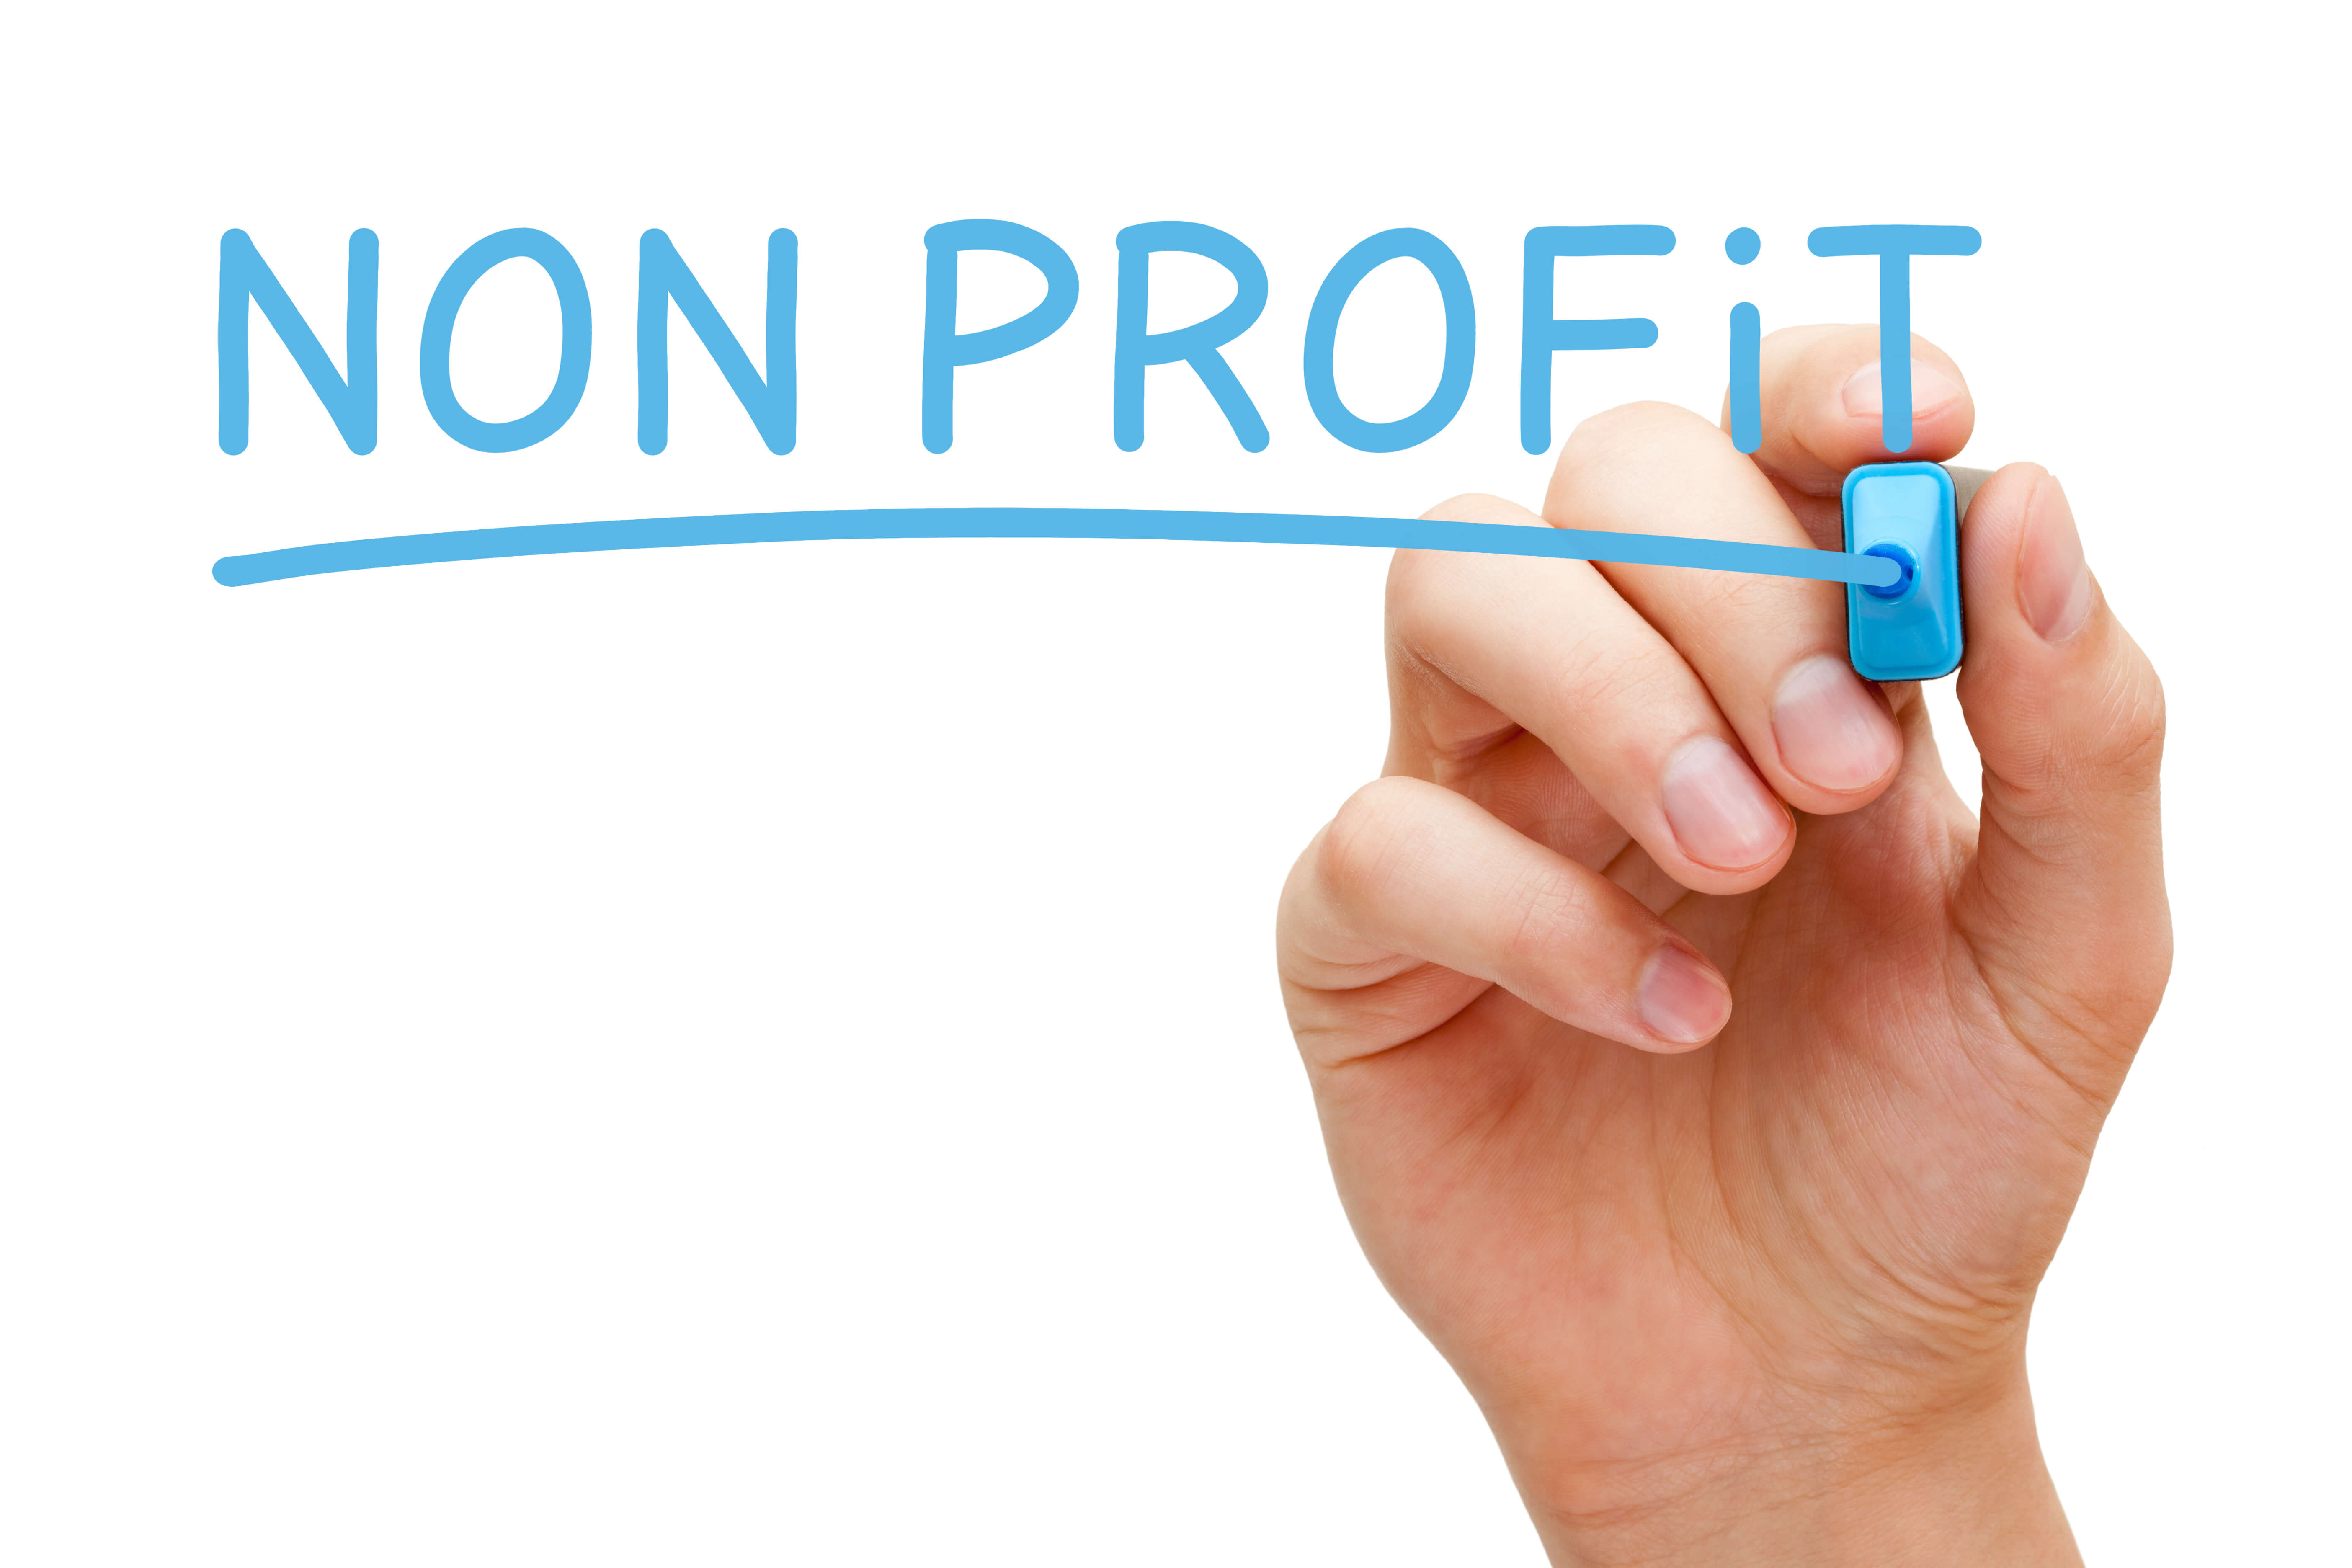 steps to starting a nonprofit organization